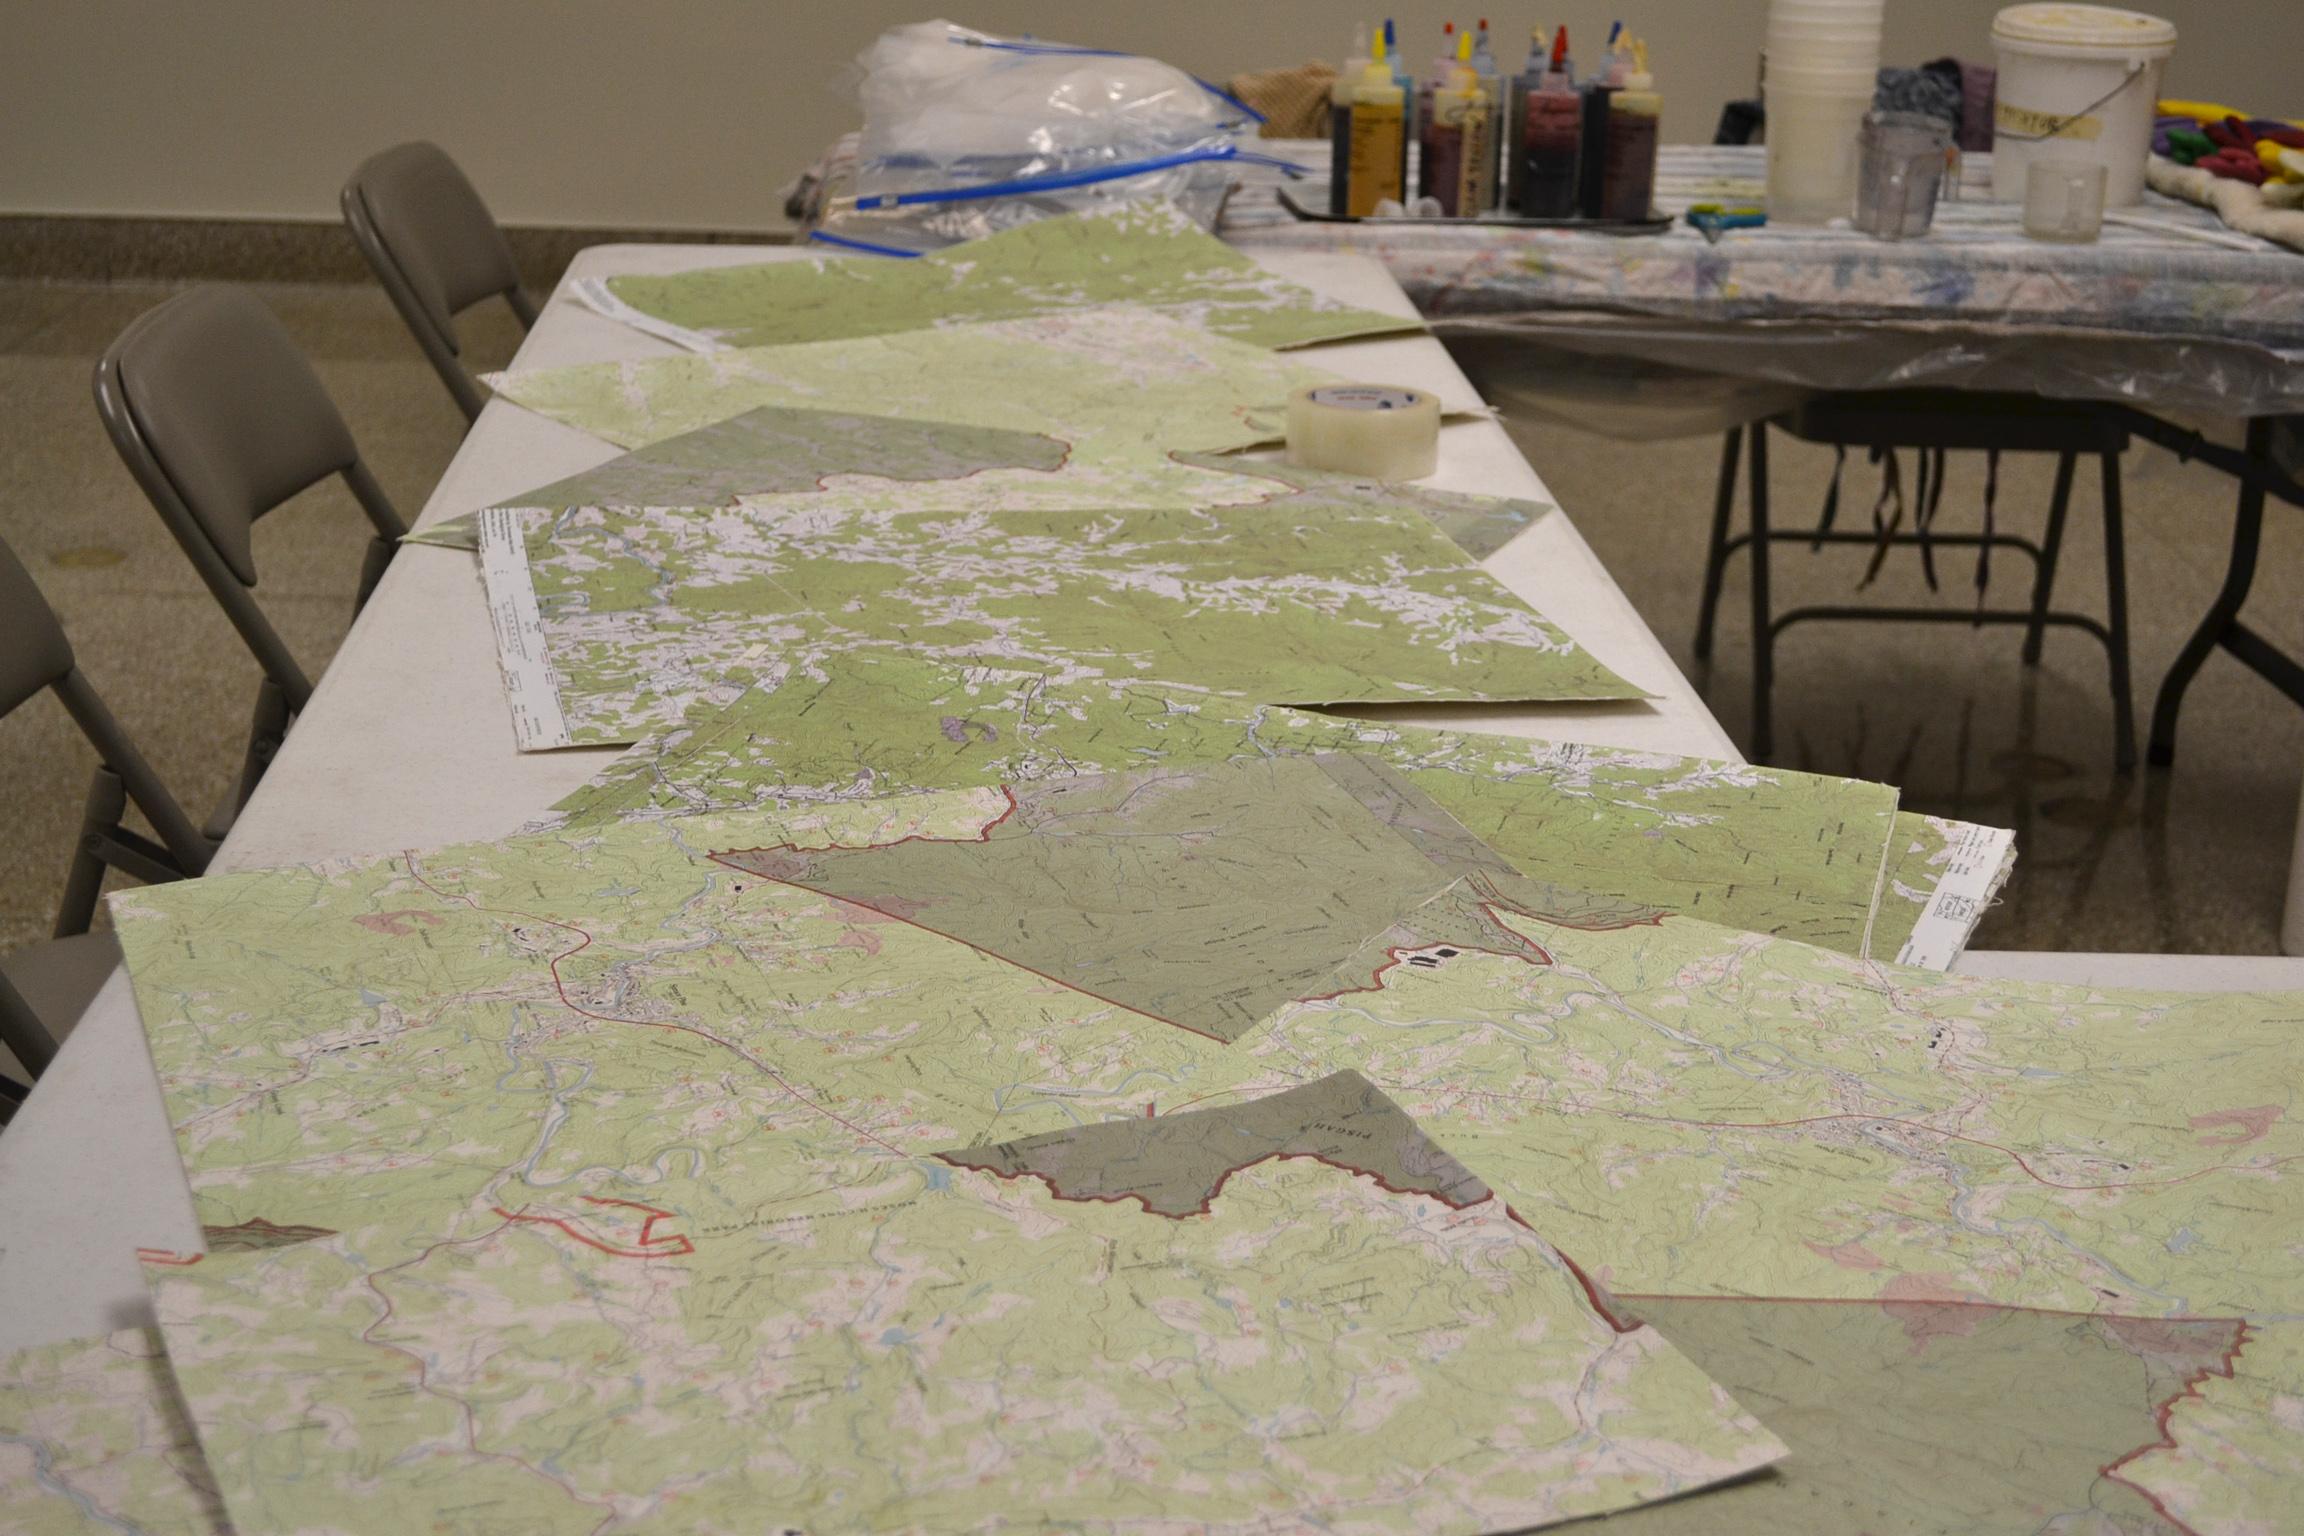 topo maps.jpg